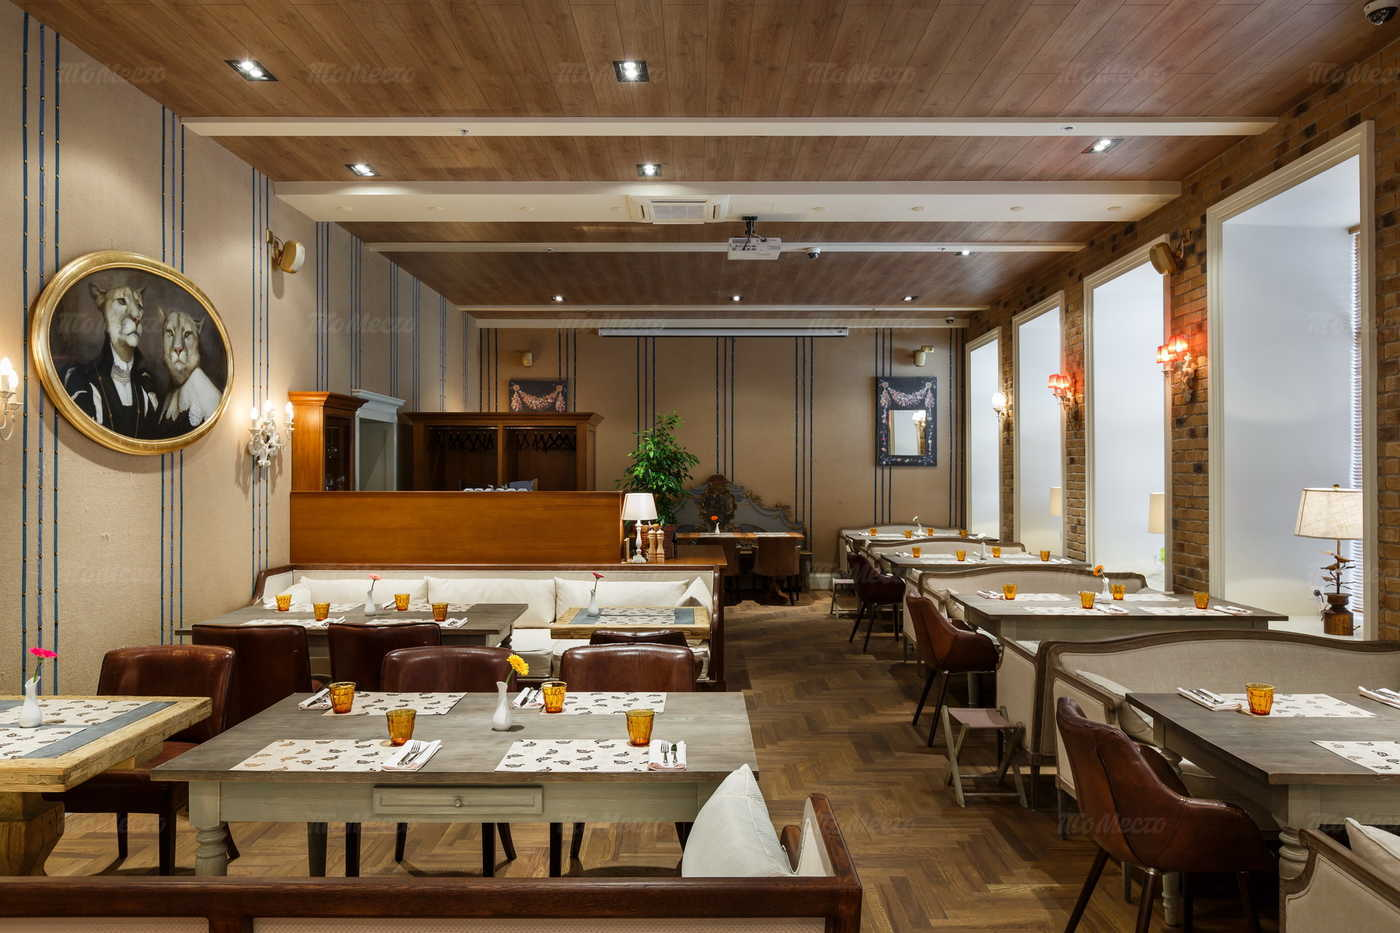 Меню ресторана Жирная утка на улице Марата